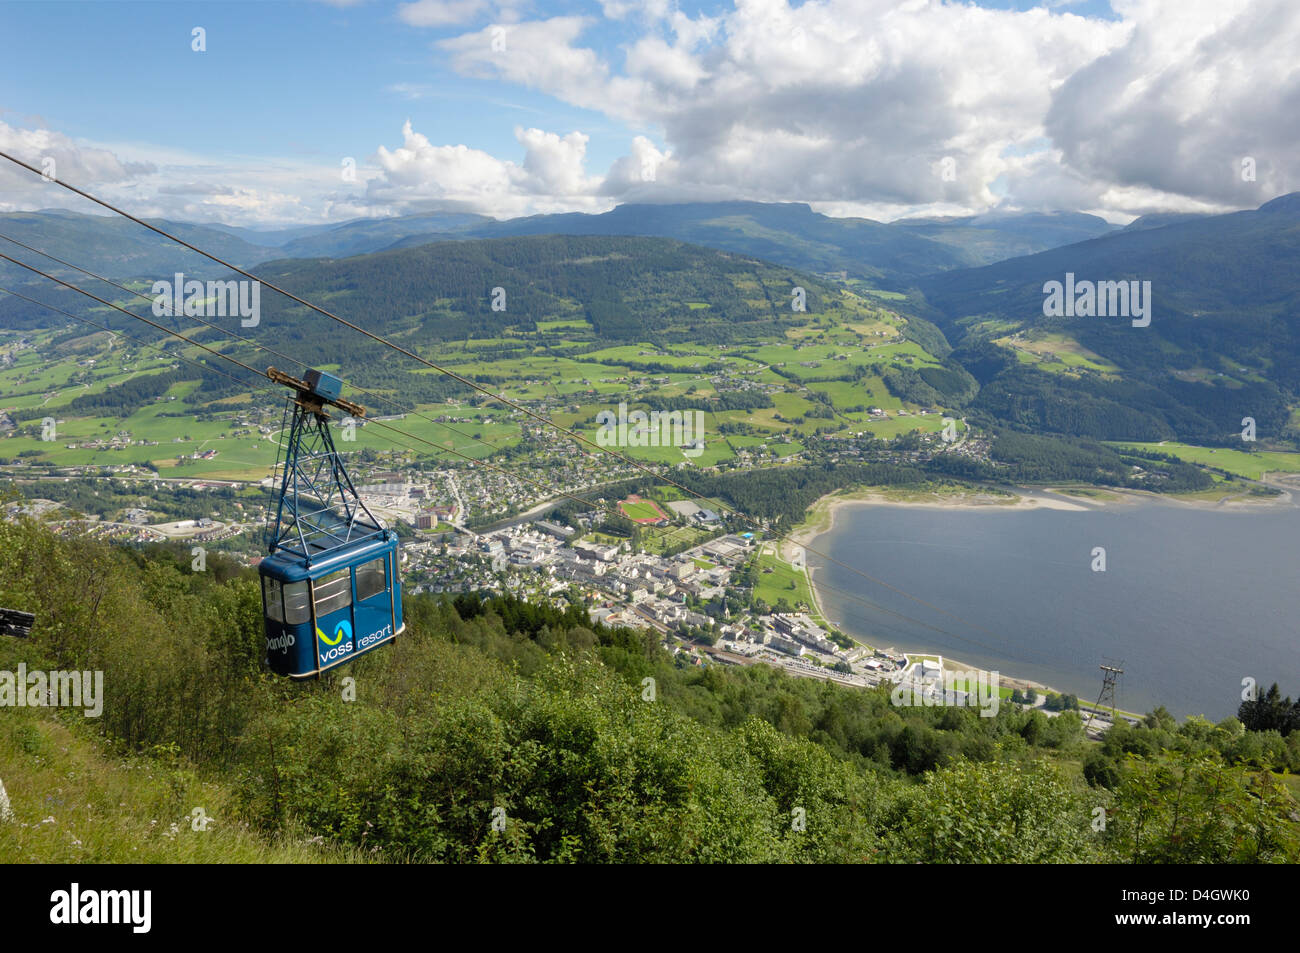 Hangursbahen, cable car to Mount Hangur, Voss, Hordaland, Norway, Scandinavia - Stock Image